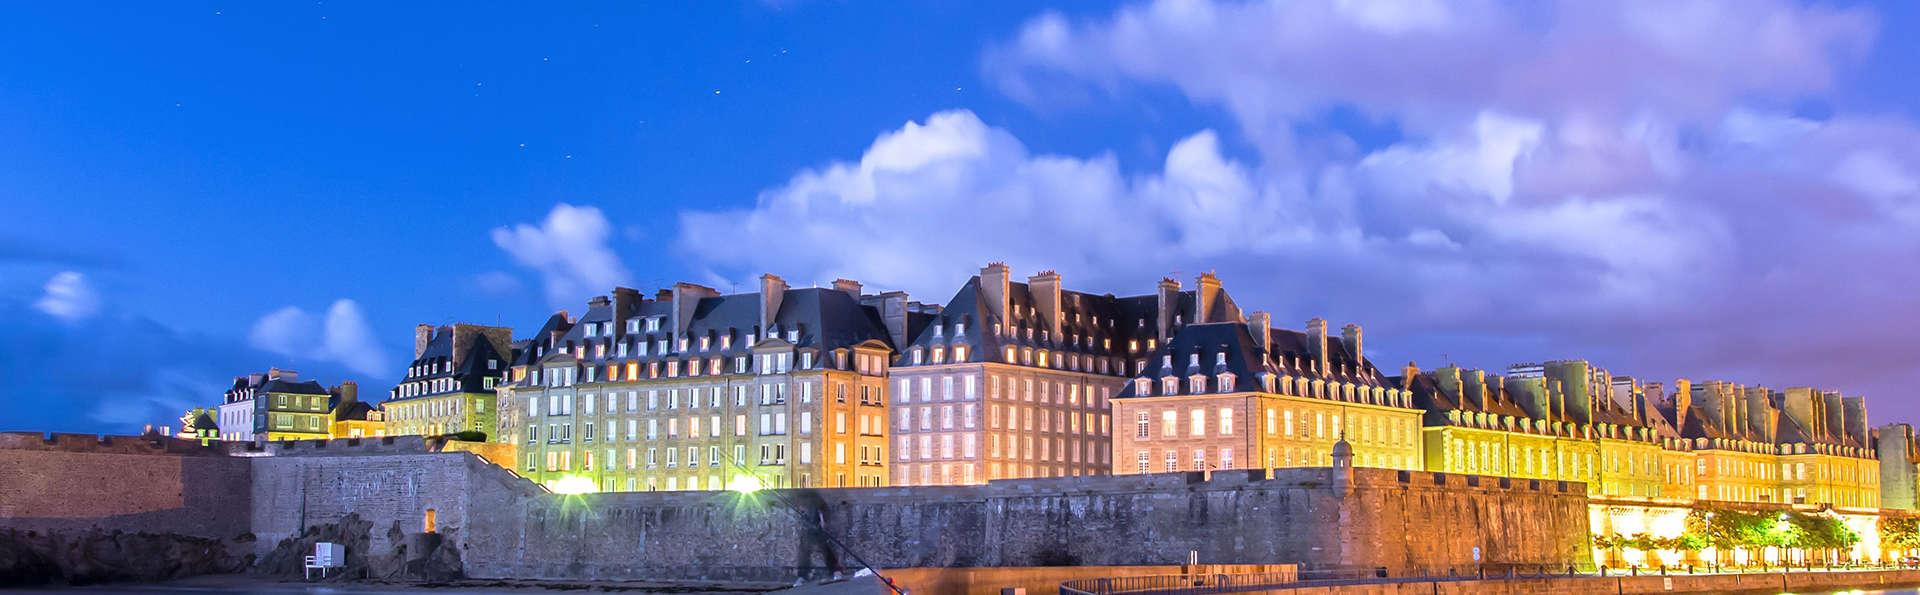 Escale iodée à Saint-Malo